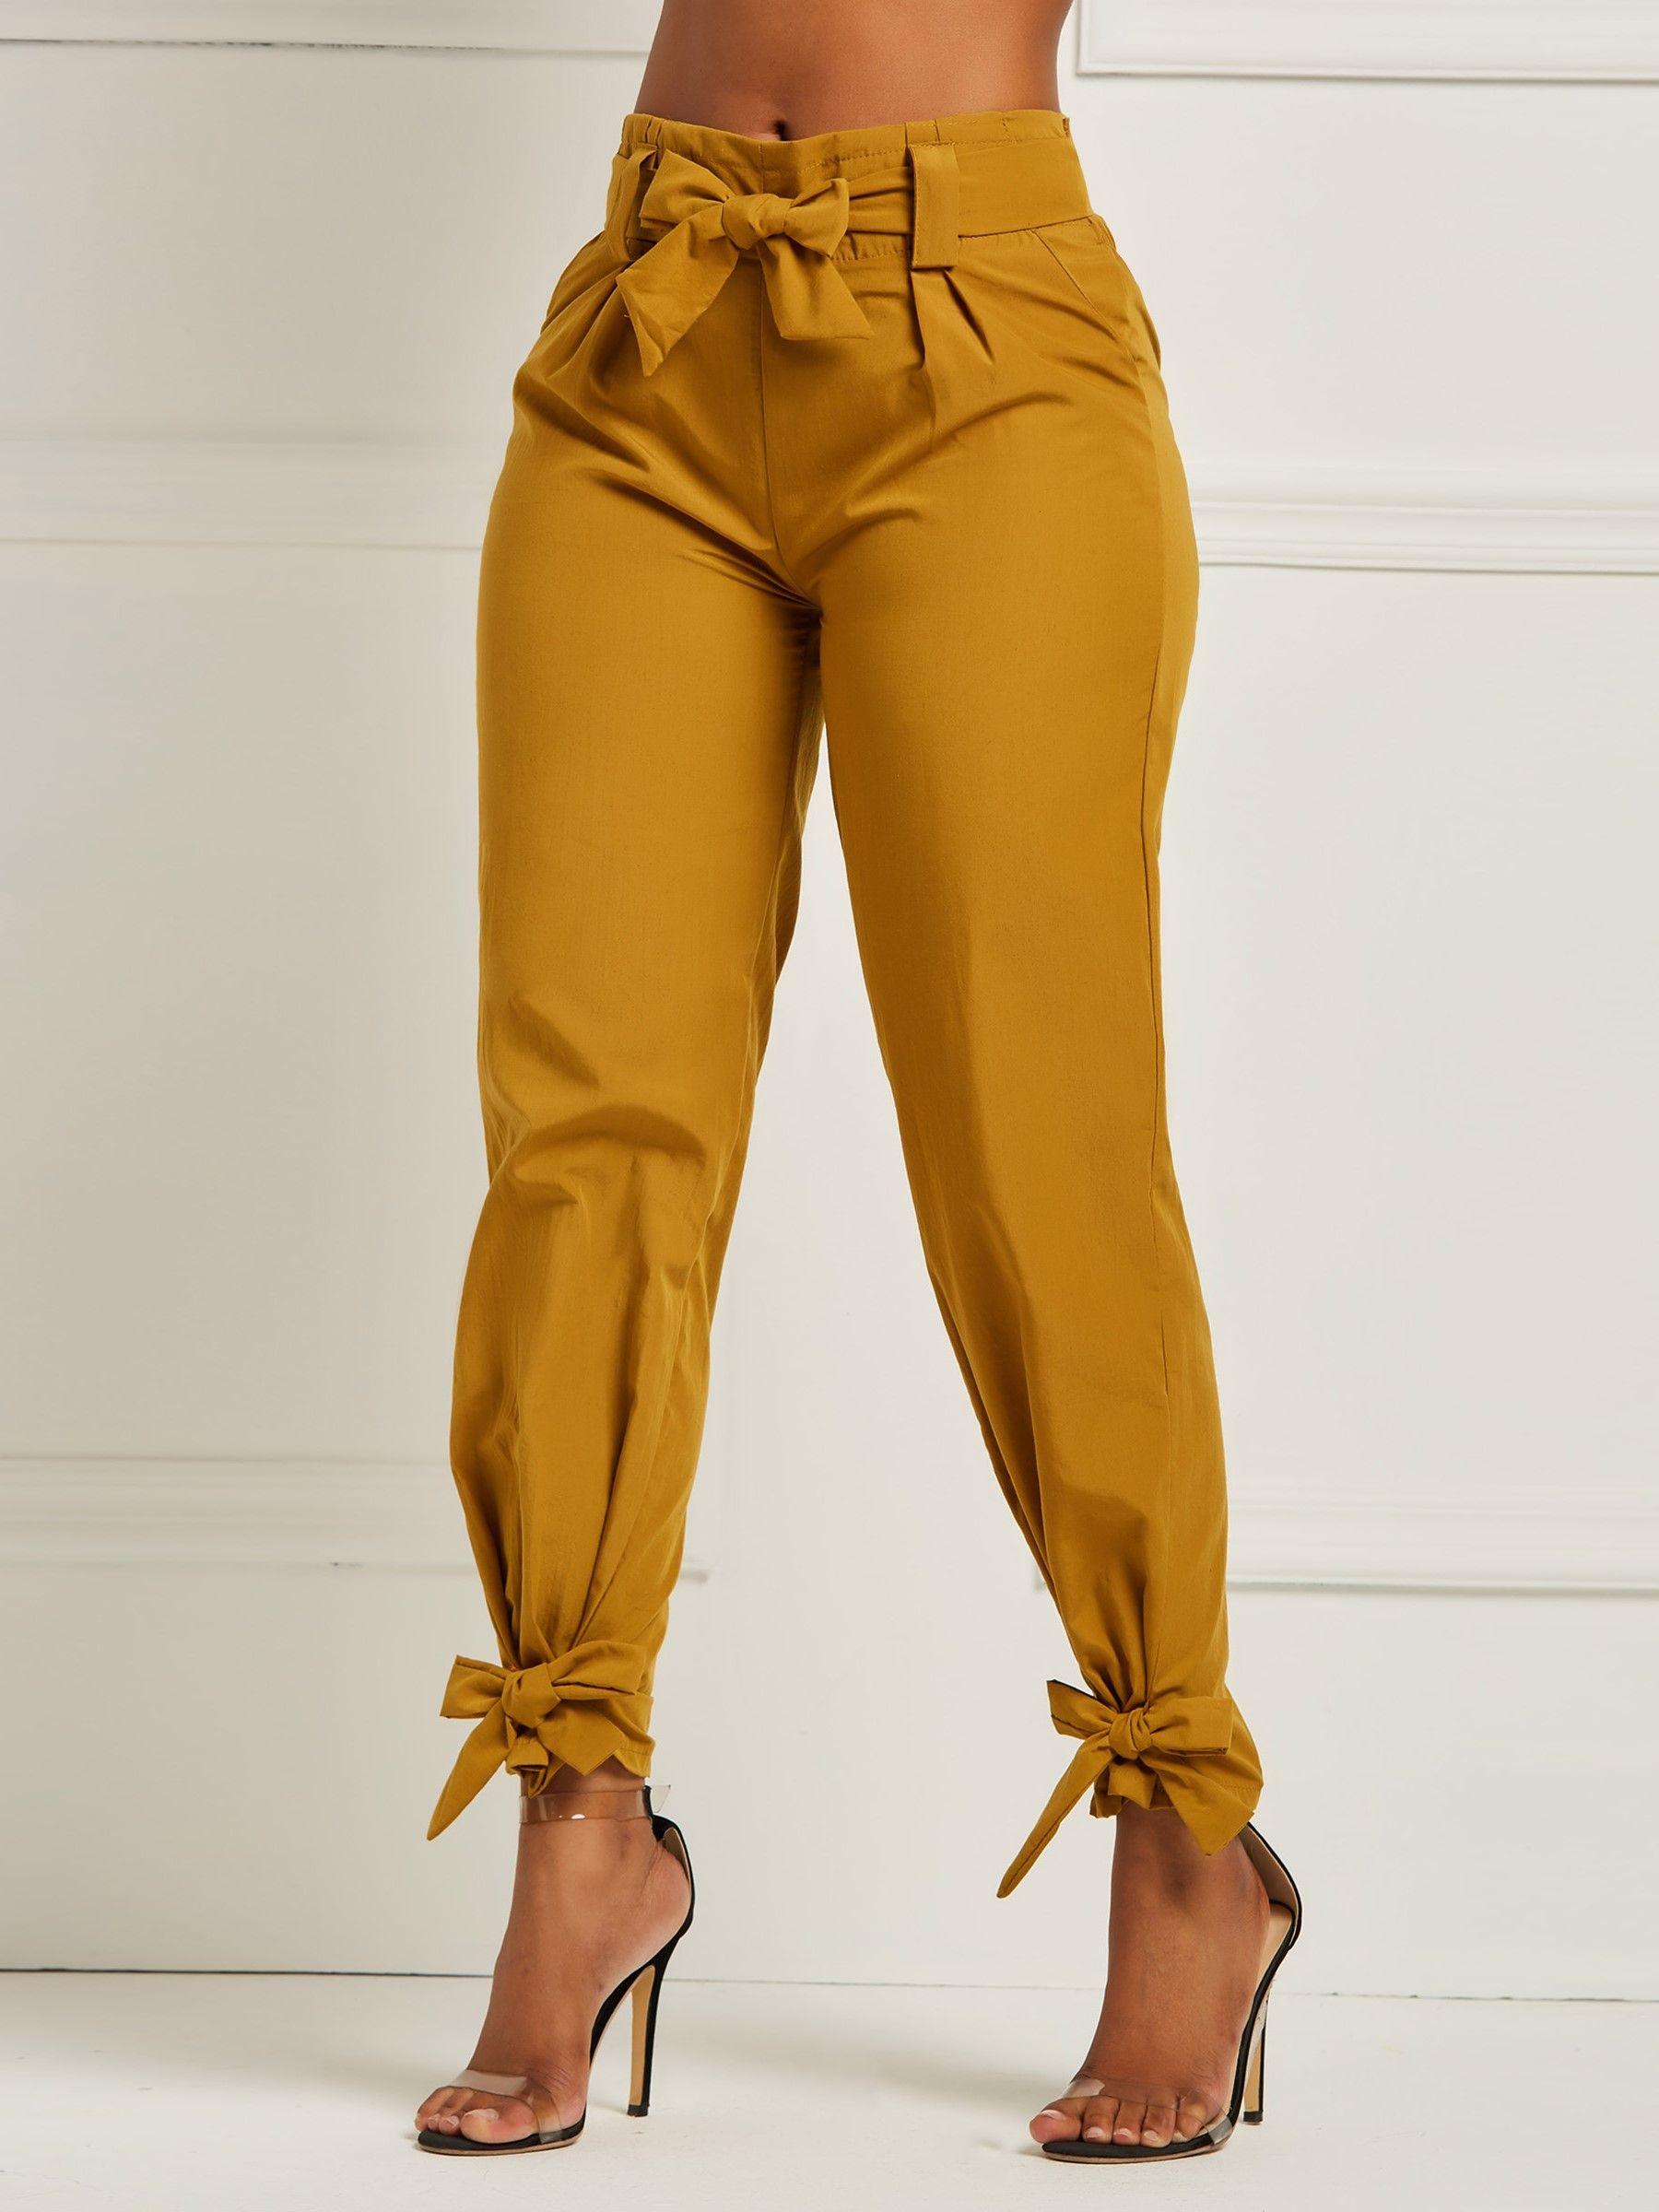 f20f7b83b72 Bowknot Plain Slim Pencil Pants Full Length Casual Pants Office Clothes  Women